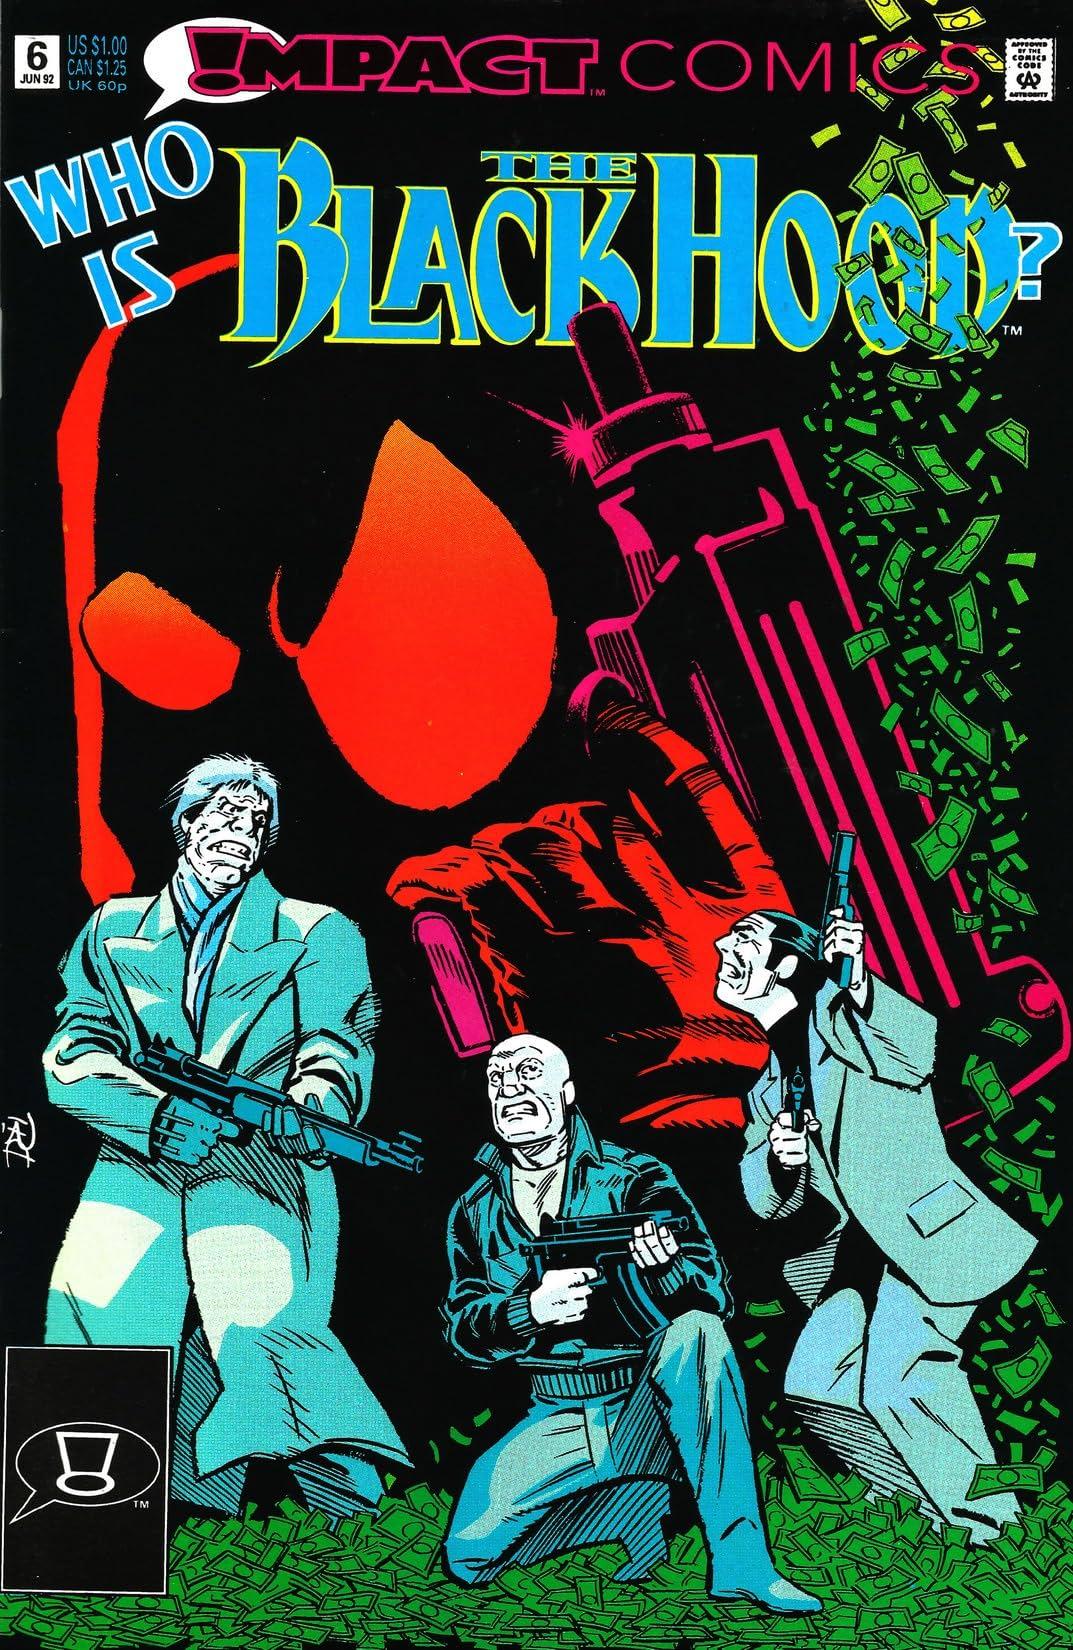 The Black Hood (Impact Comics) #6